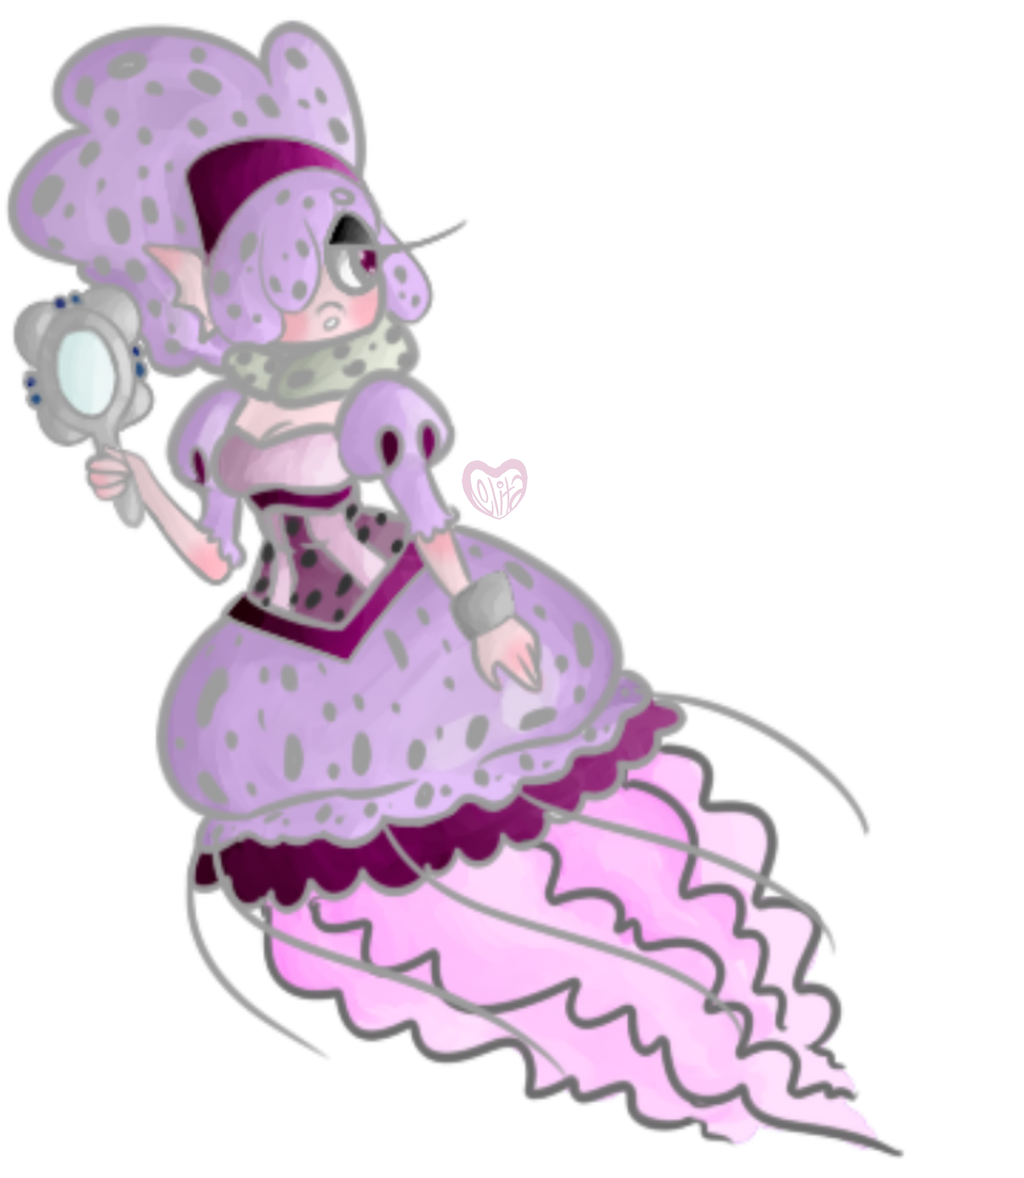 the jellyfish princess by lolitaoftheundead on deviantart